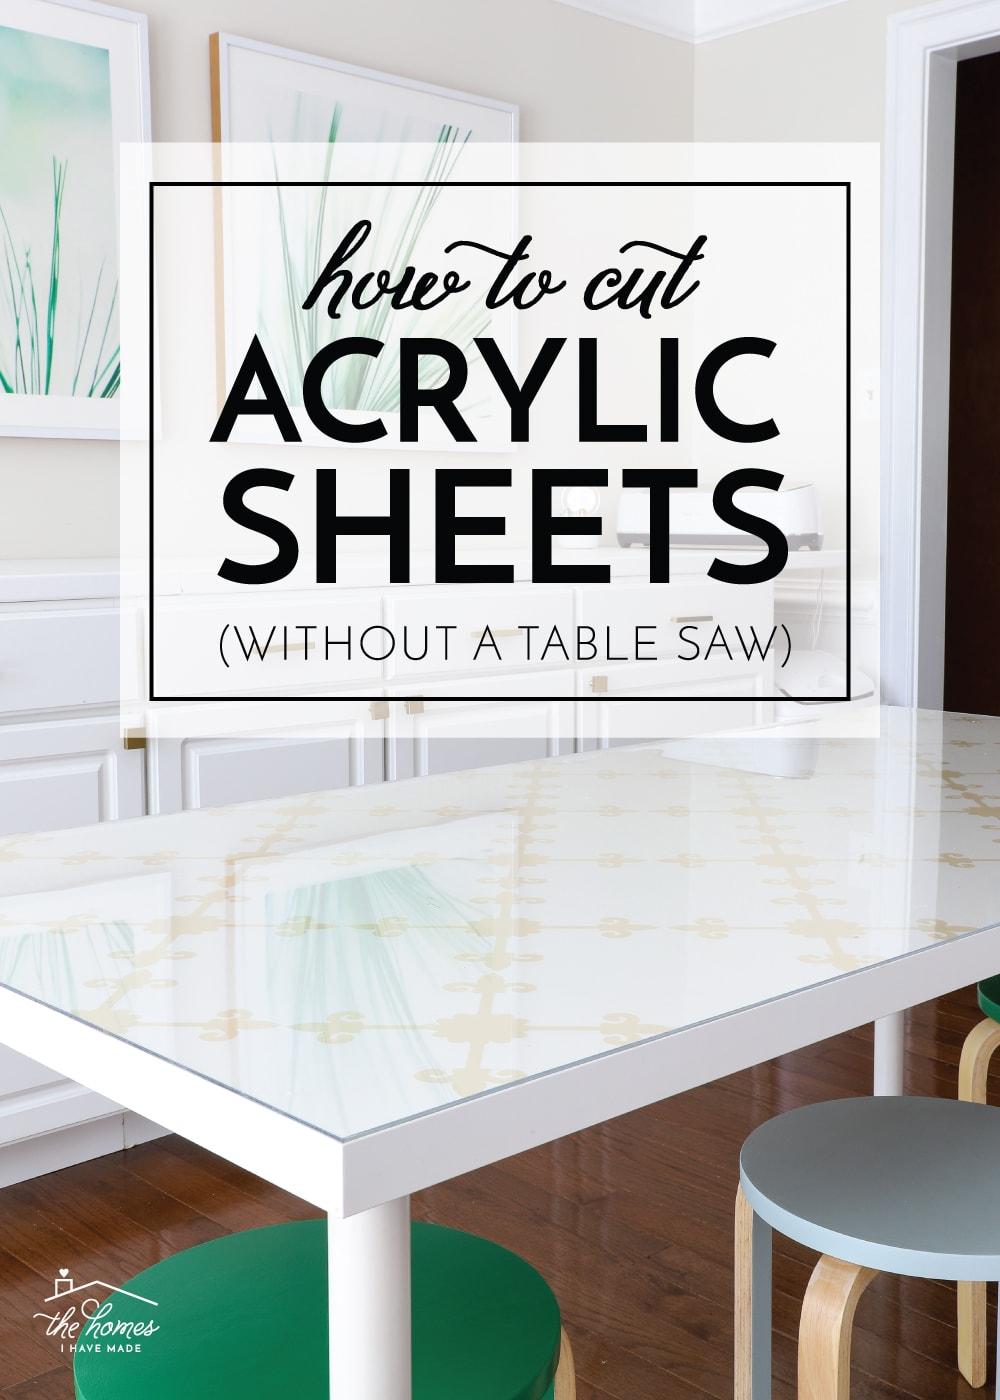 How to Cut Acrylic